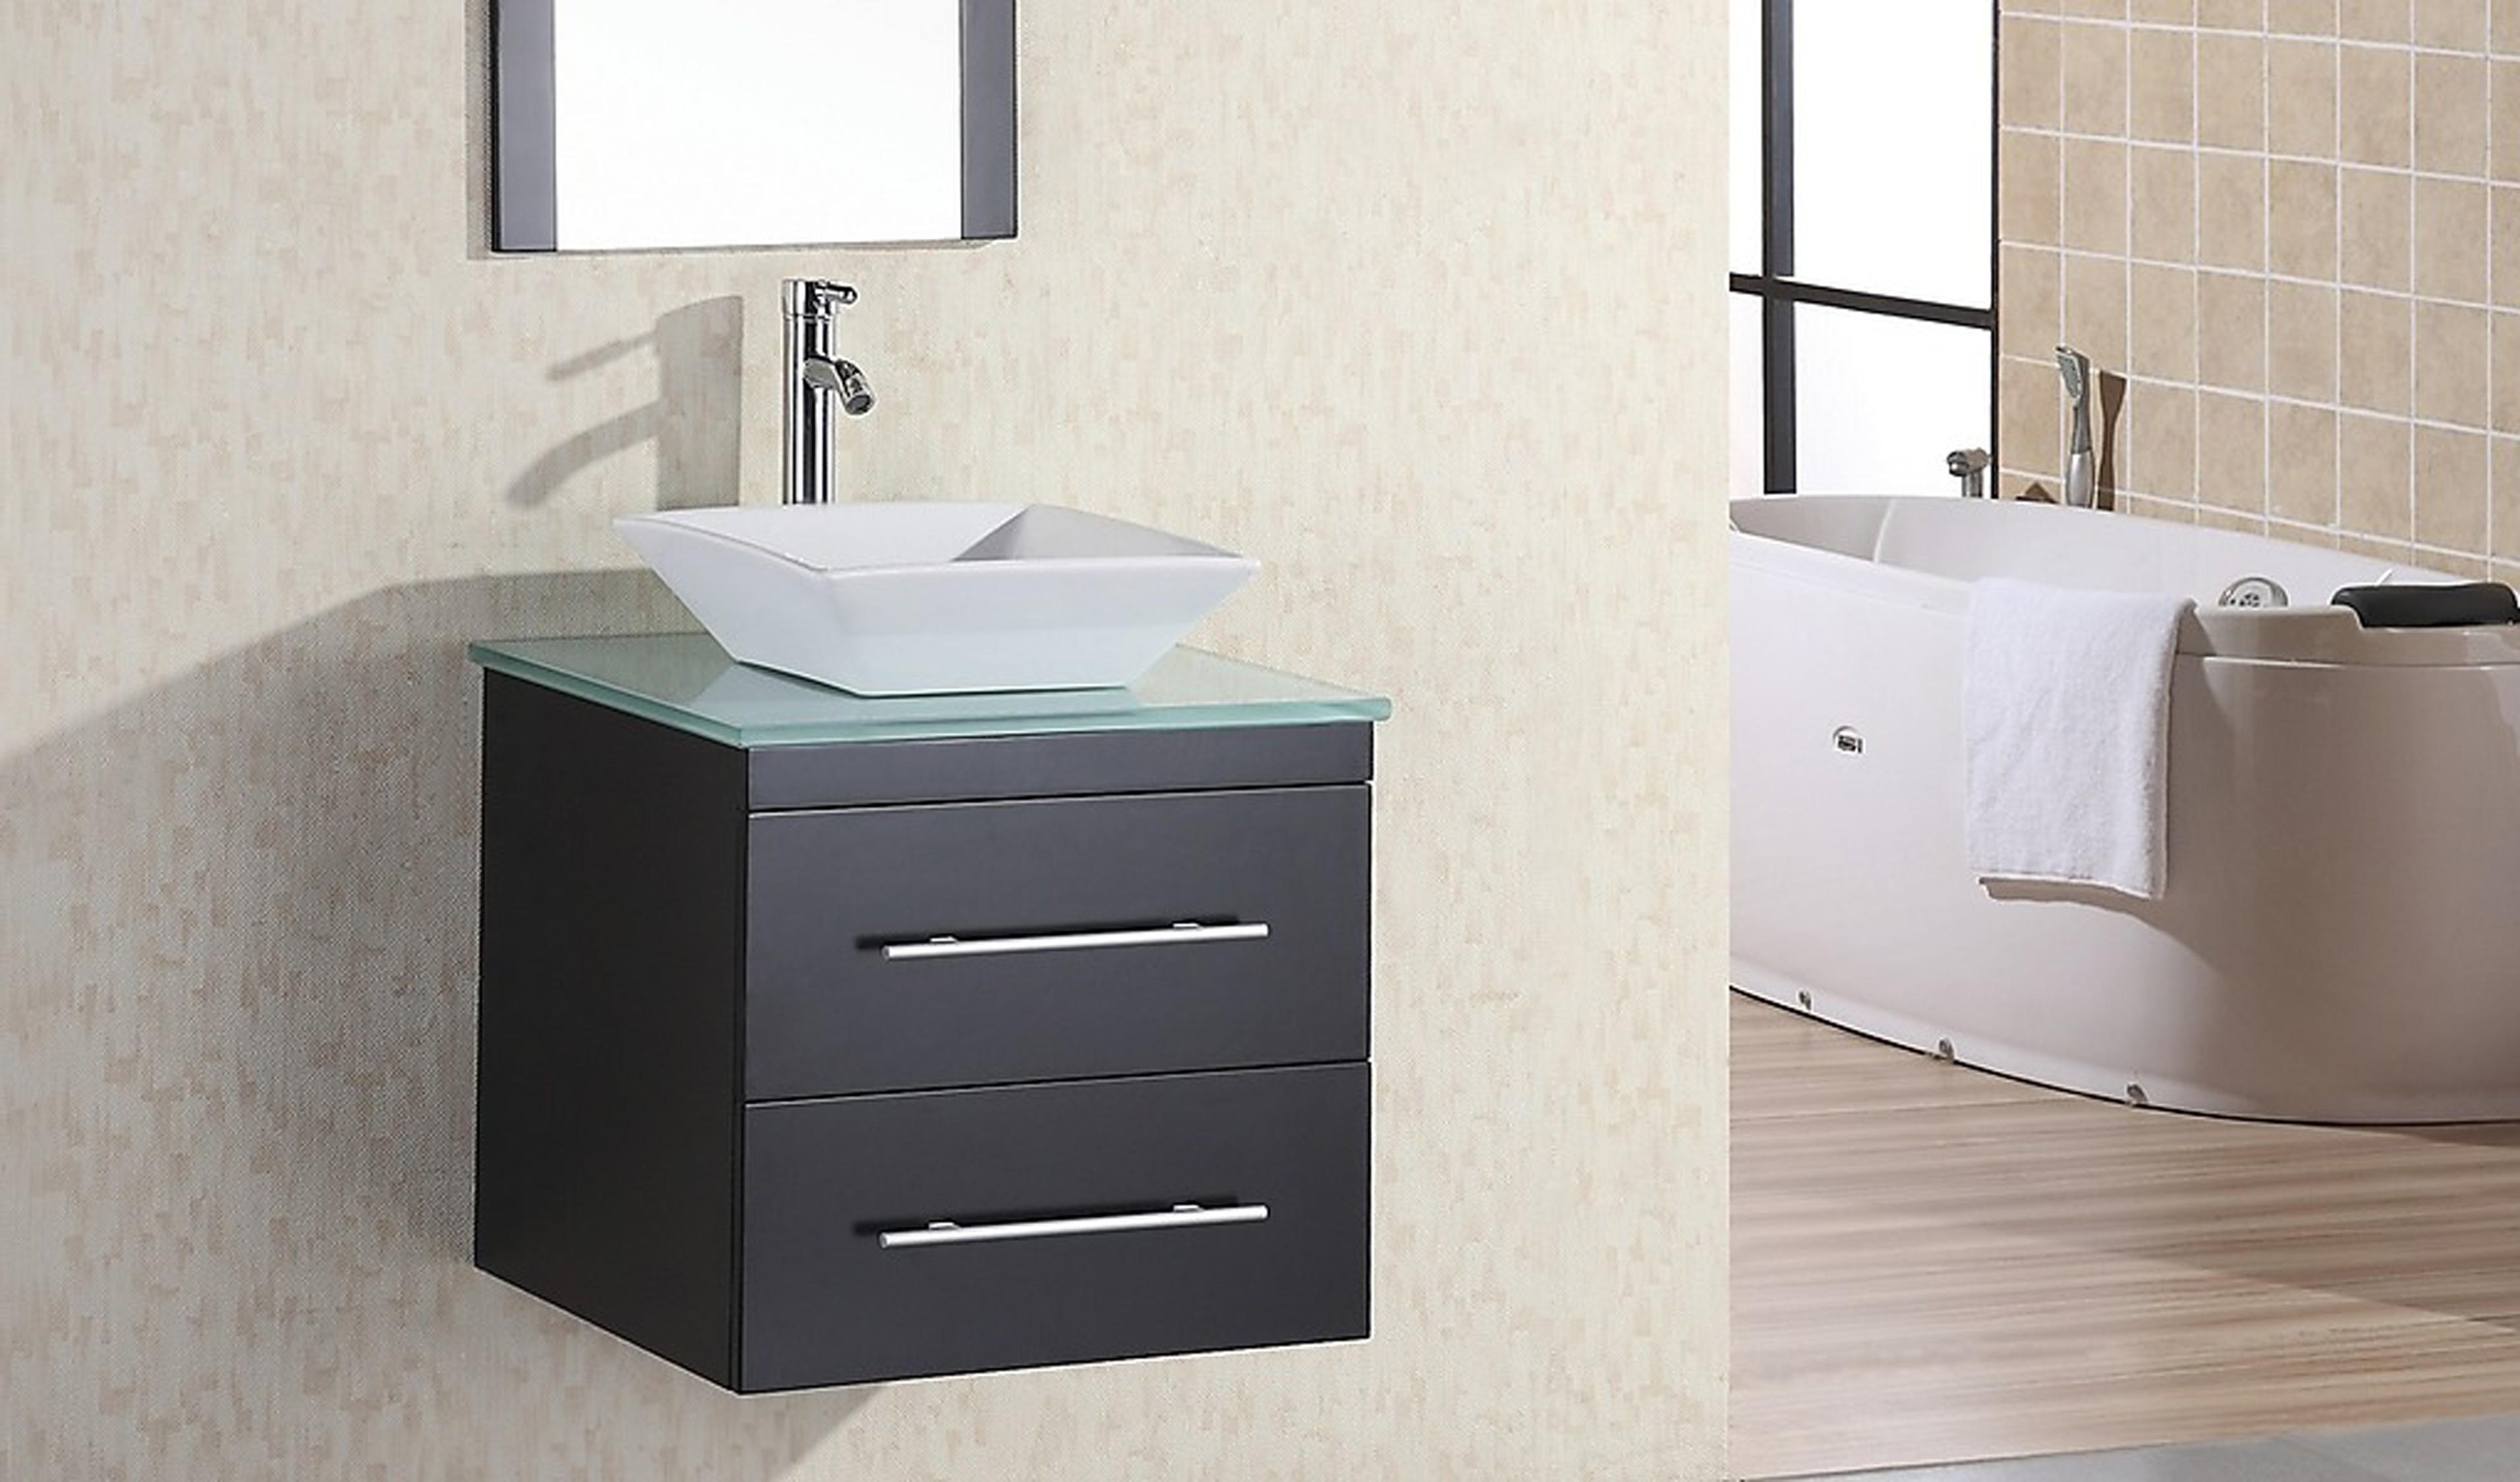 latest home depot bathroom vanities with tops picture-Cool Home Depot Bathroom Vanities with tops Photo